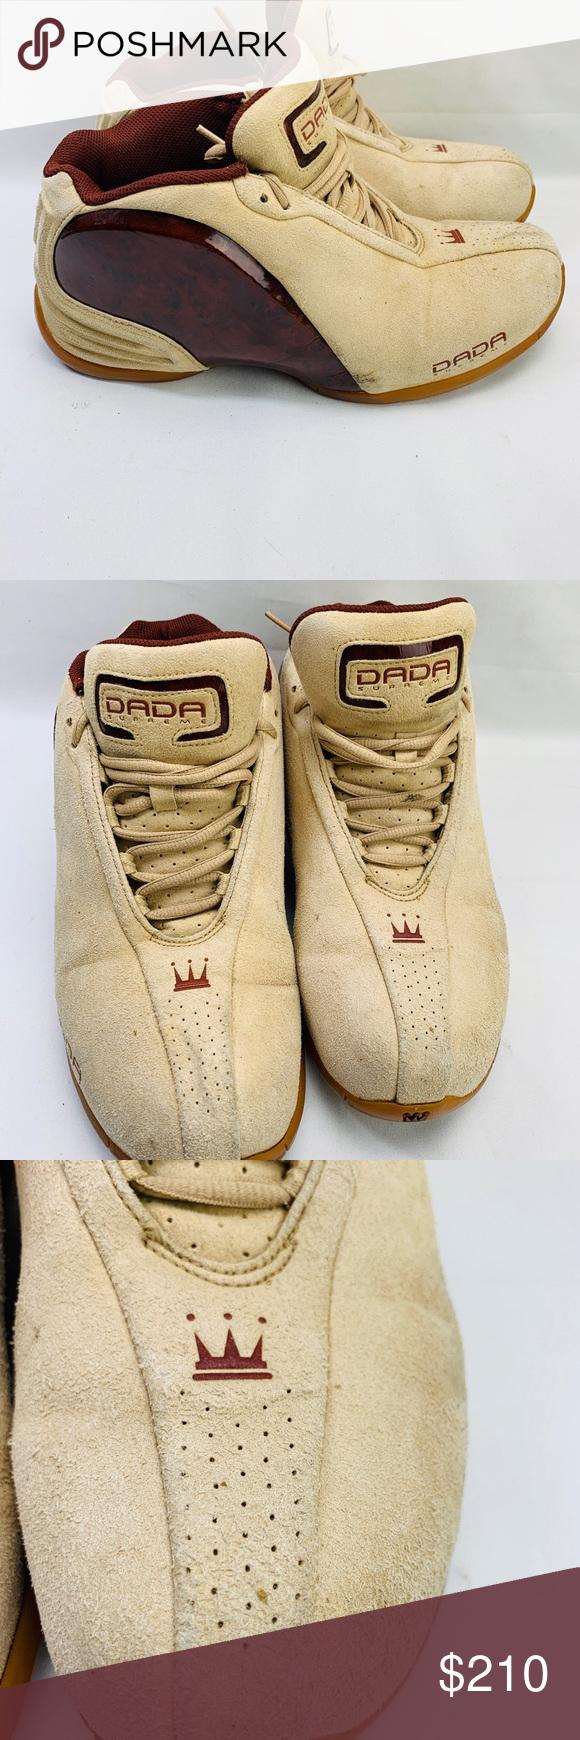 Dada supreme vintage sneaker size 11.5 Dada Supreme Mens